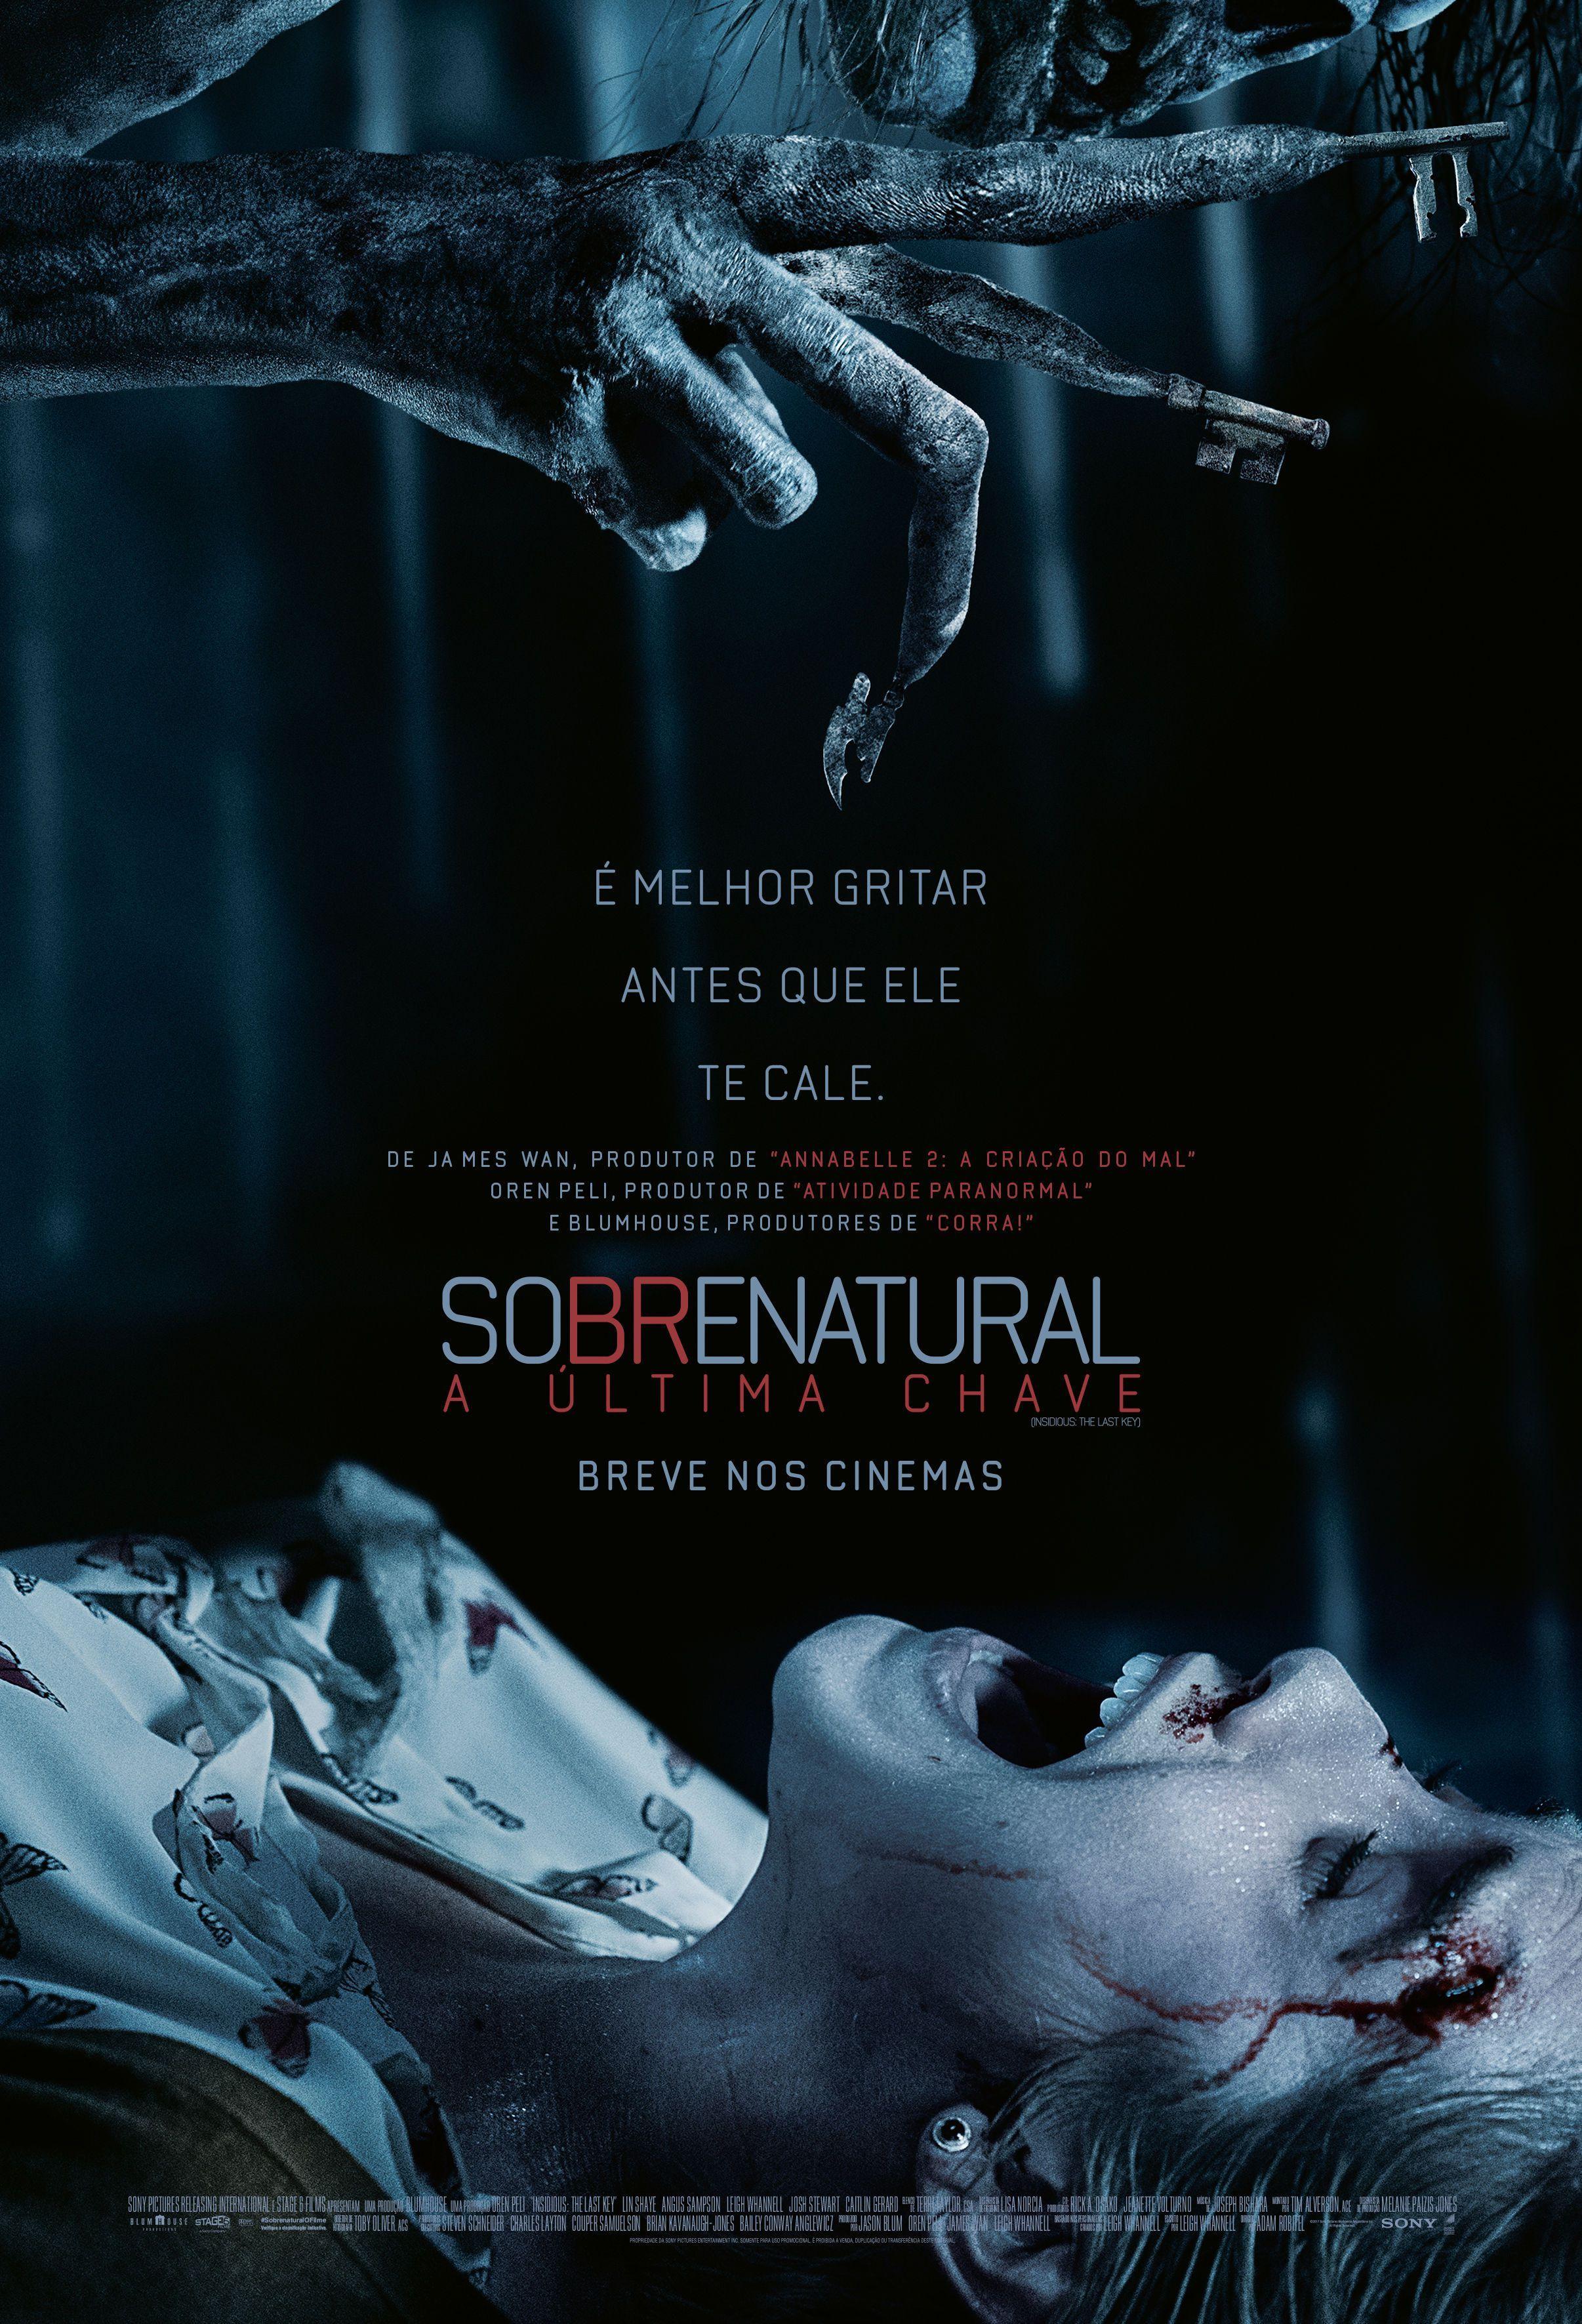 Sobrenatural A Ultima Chave Filmes Online Gratis Filmes De